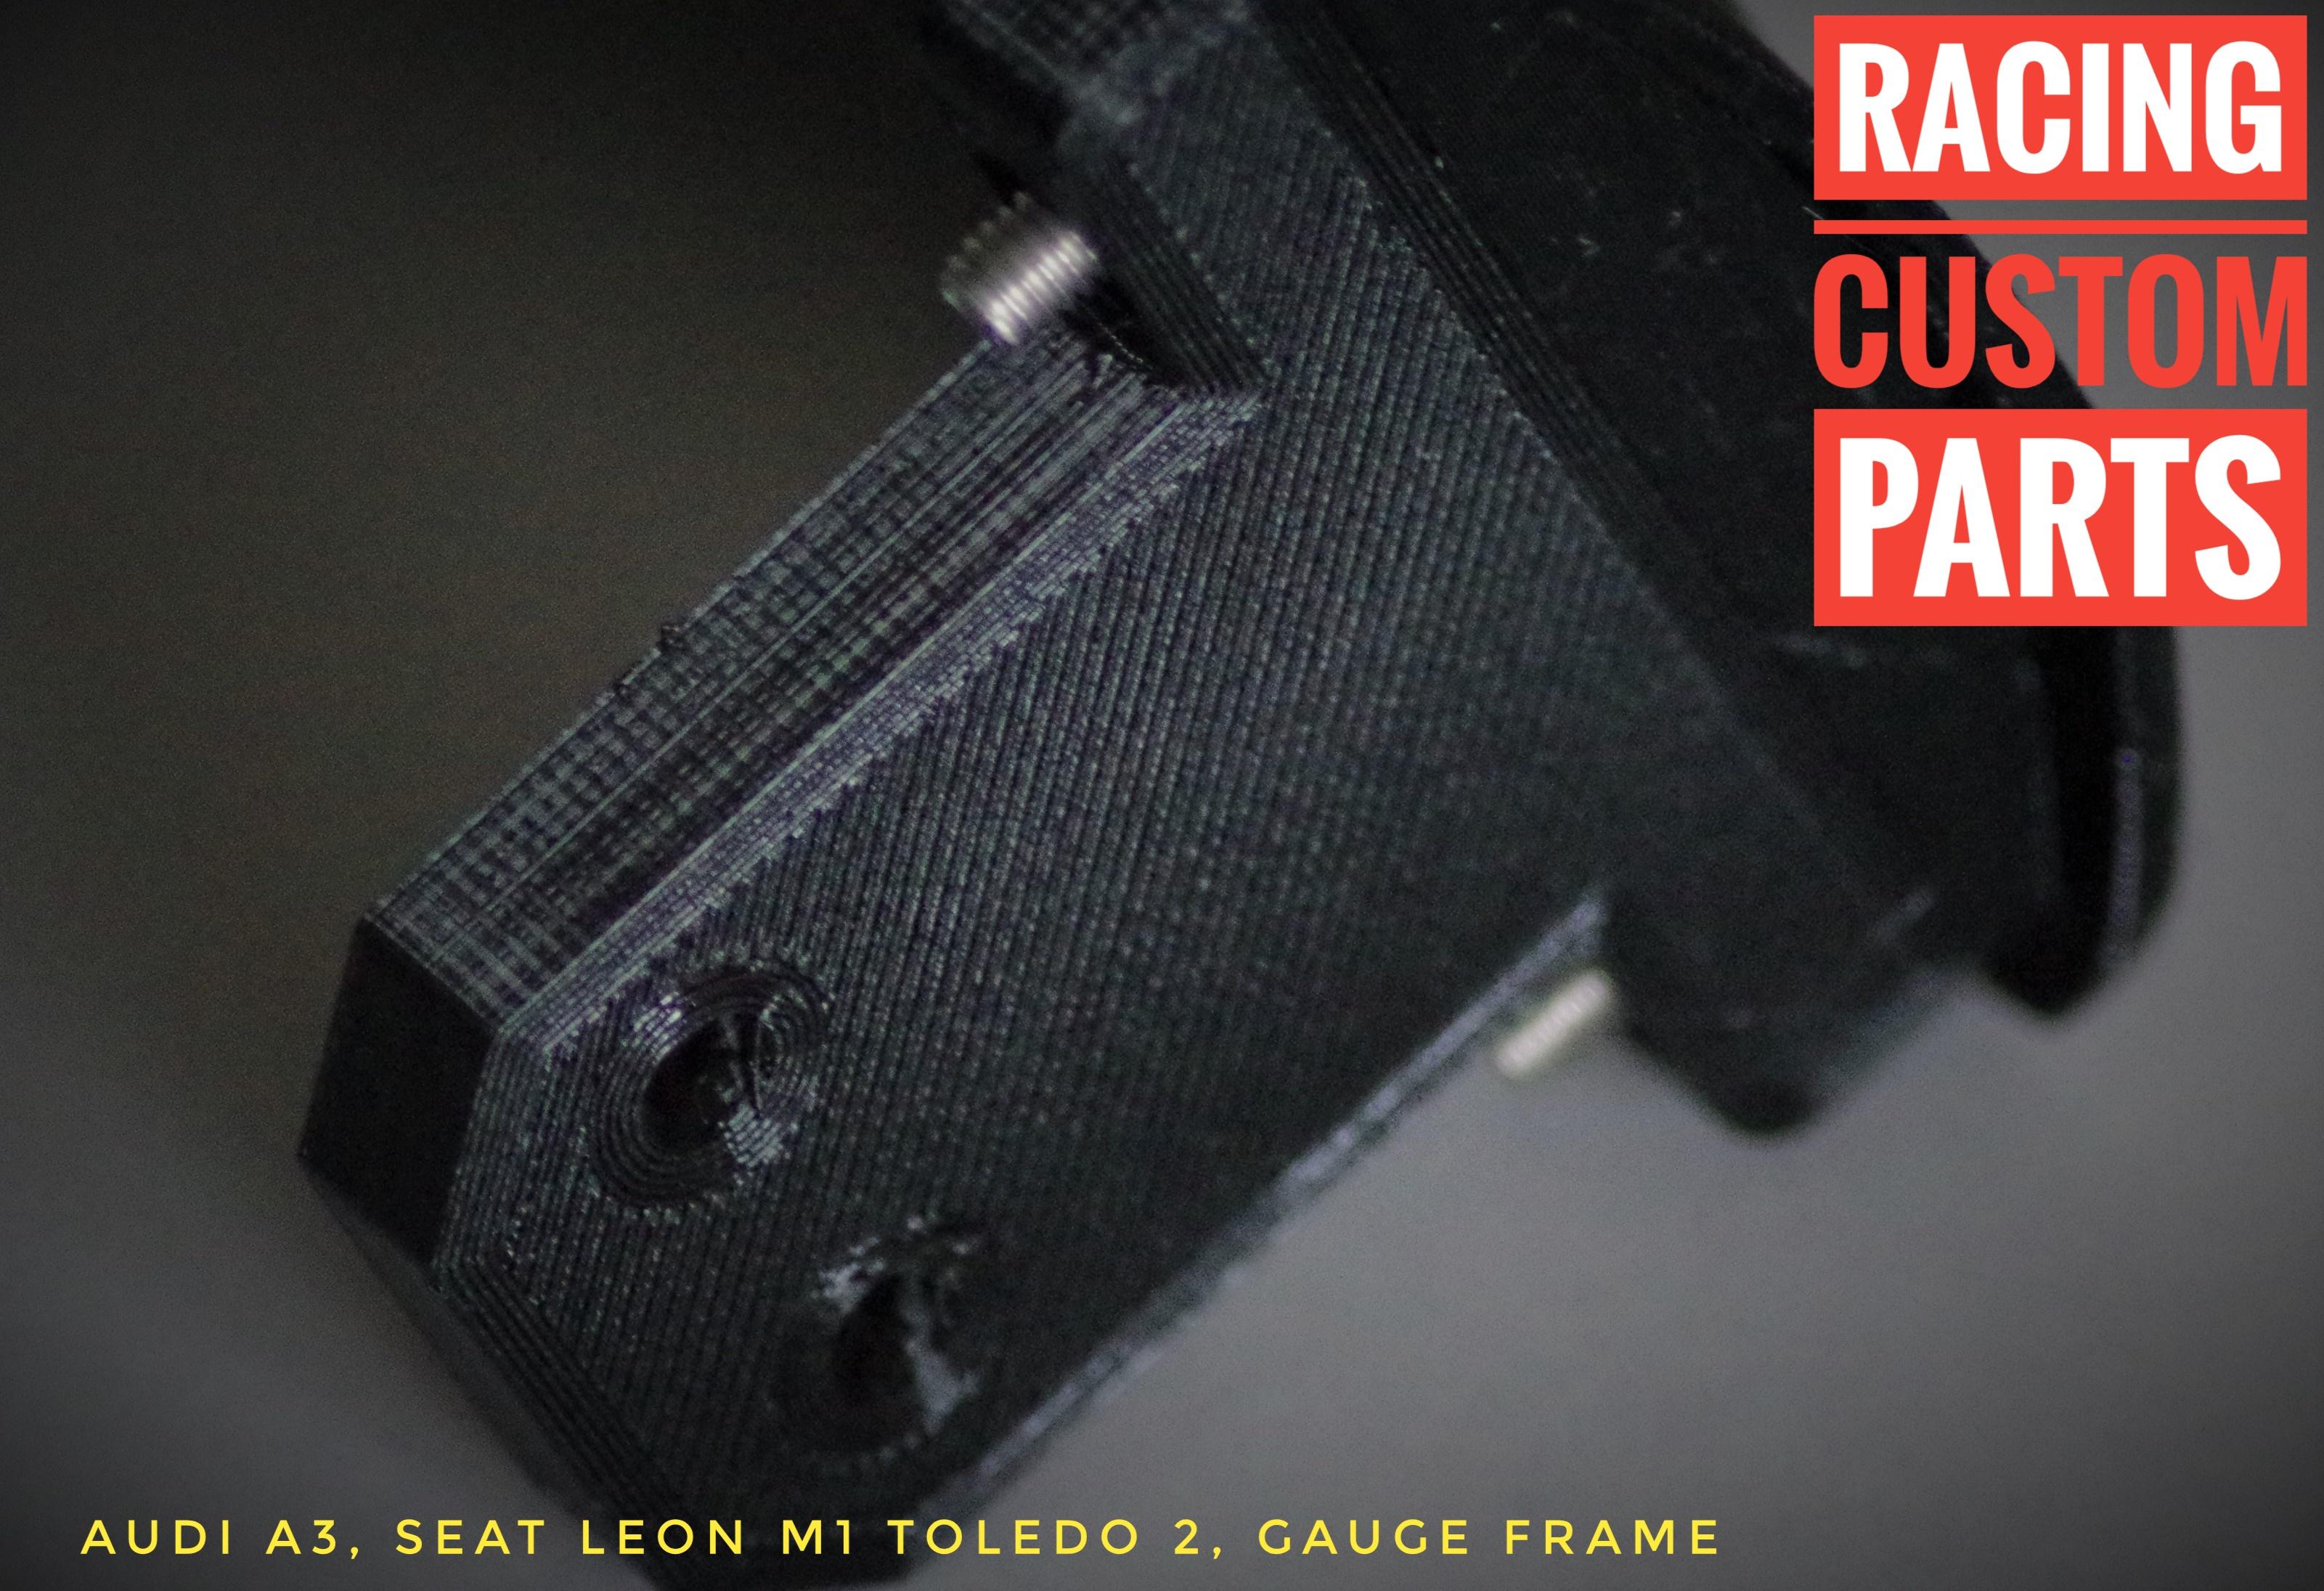 Gauge Frame Audi A3 8L Seat Leon 1M Toledo 2 racing custom parts 3d print car parts